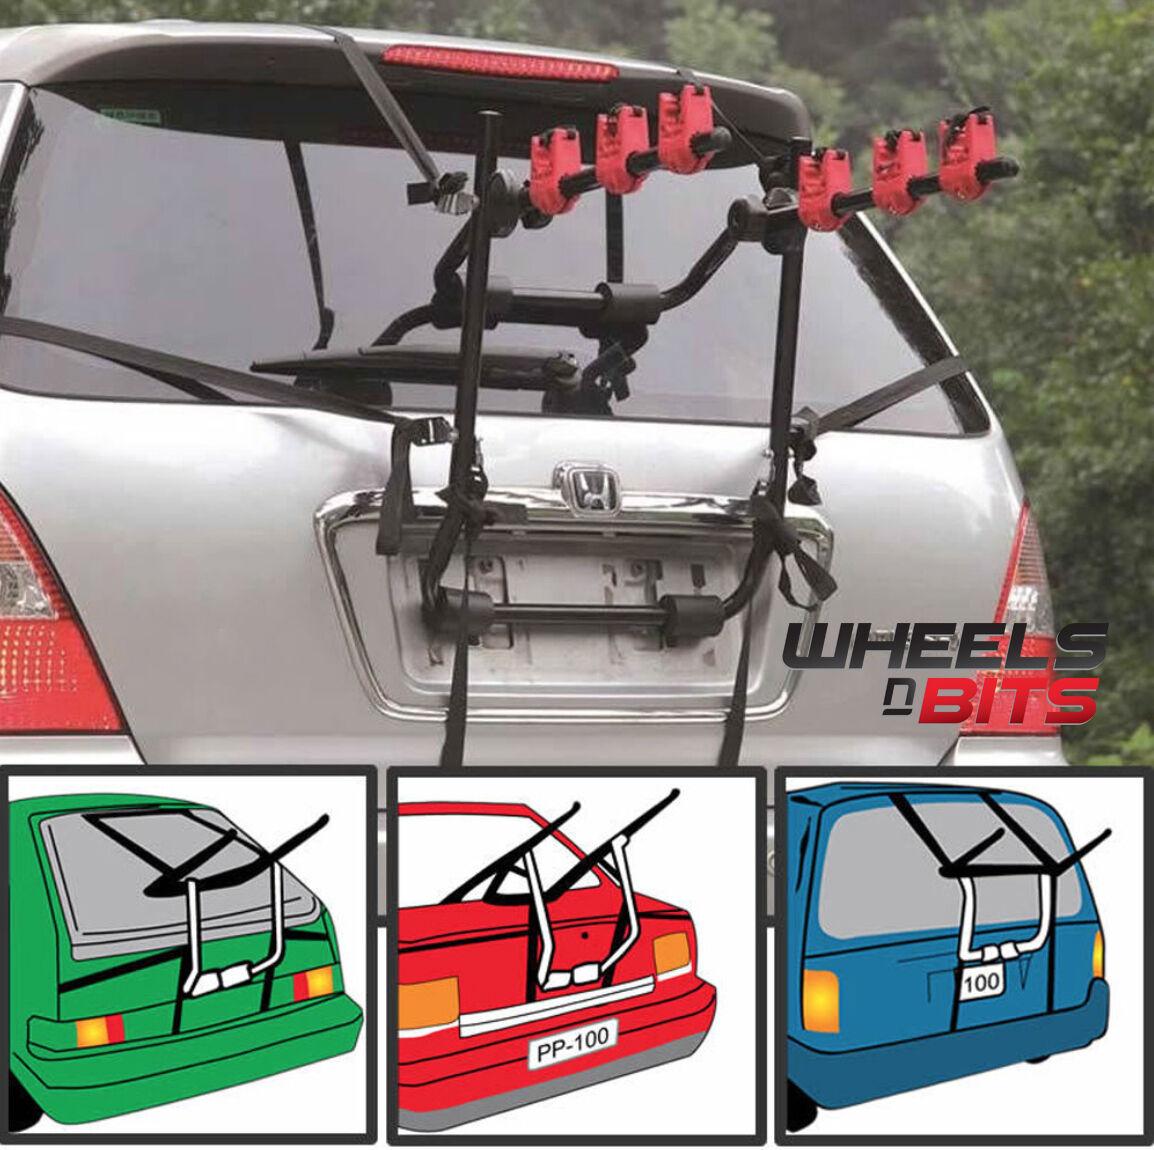 Wheels N Bits 3 Bicycle Carrier Car Suv 4x4 Rack Bike Cycle